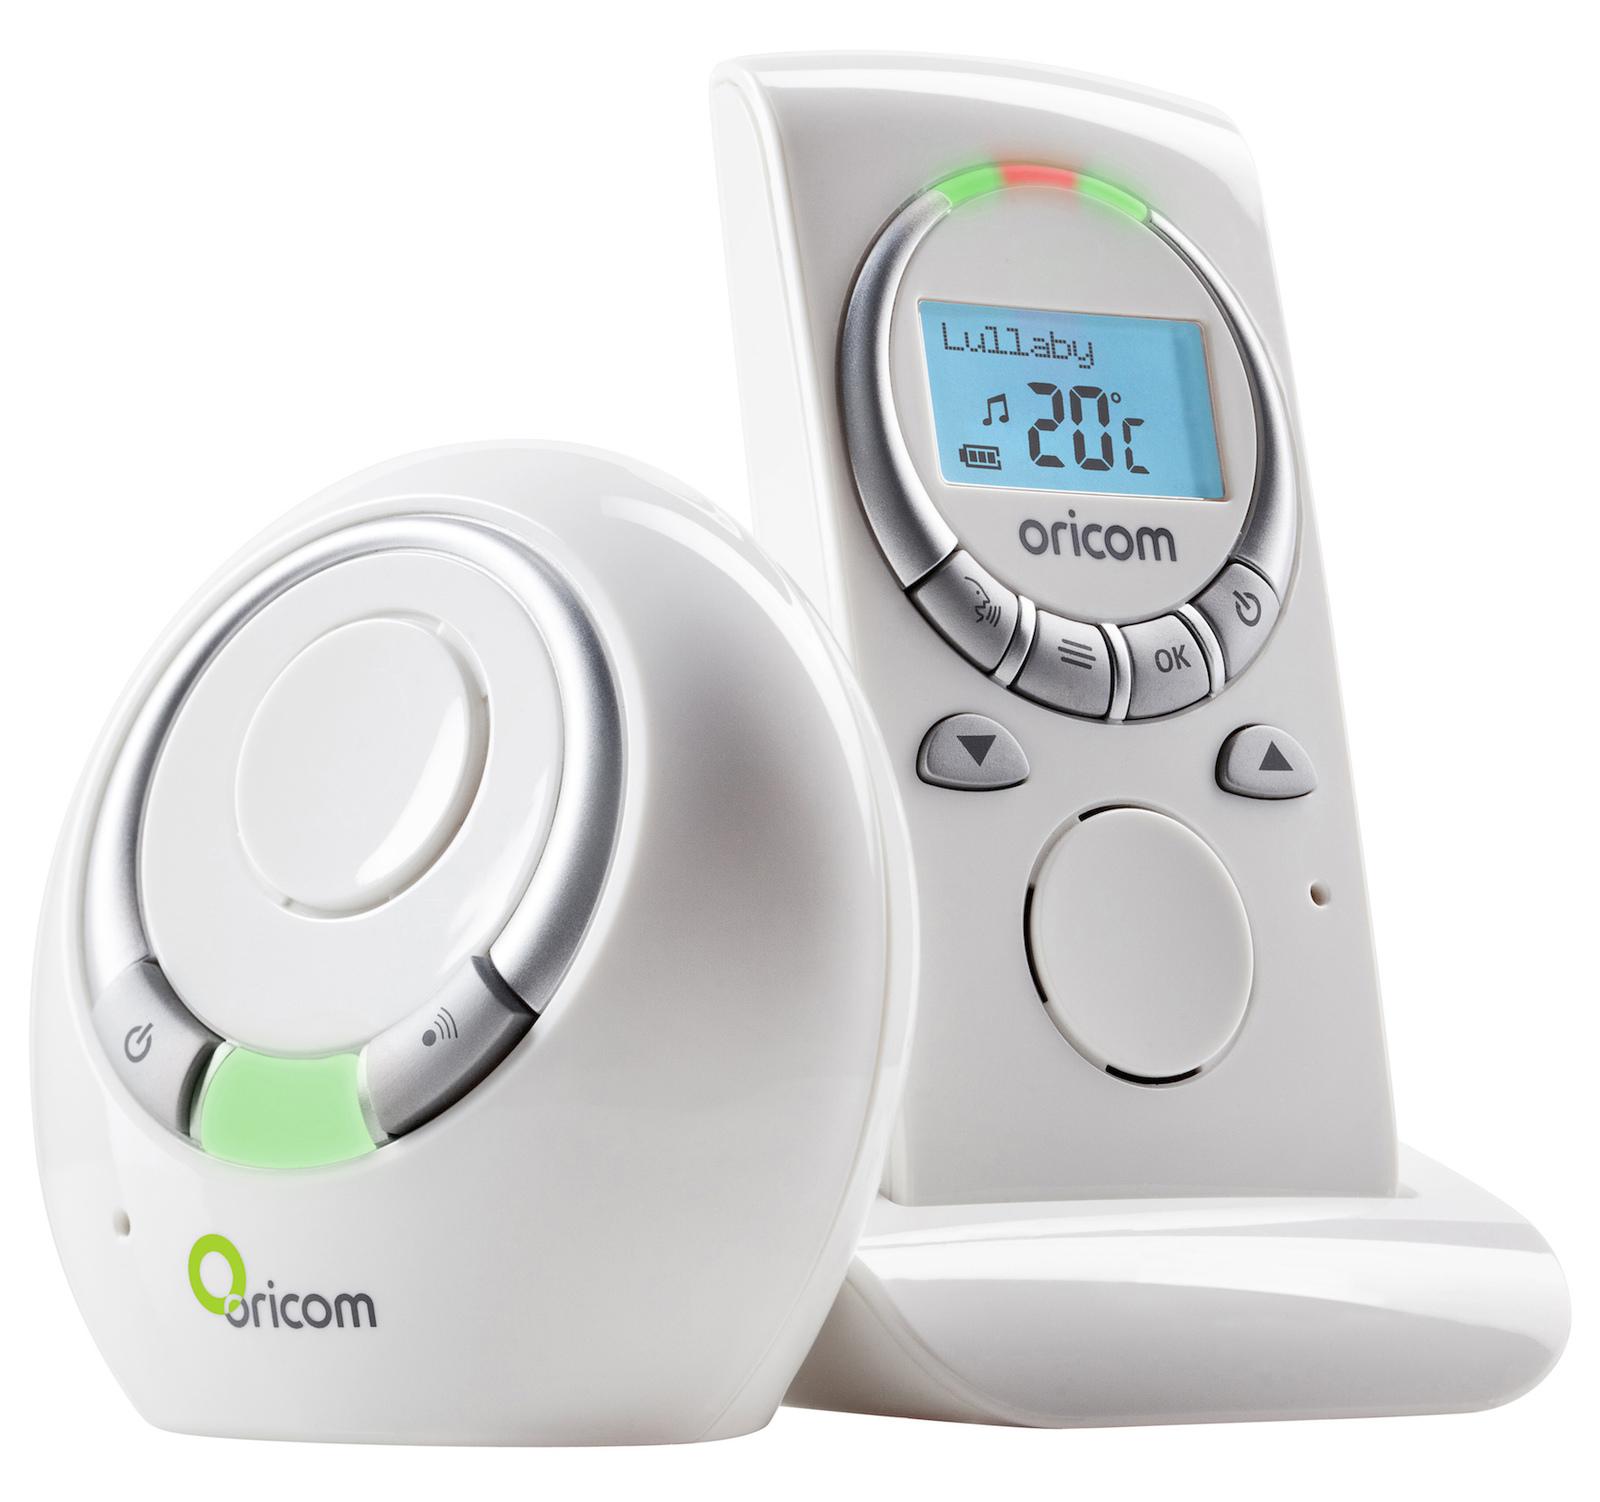 Oricom: Secure210 DECT Digital Baby Monitor image